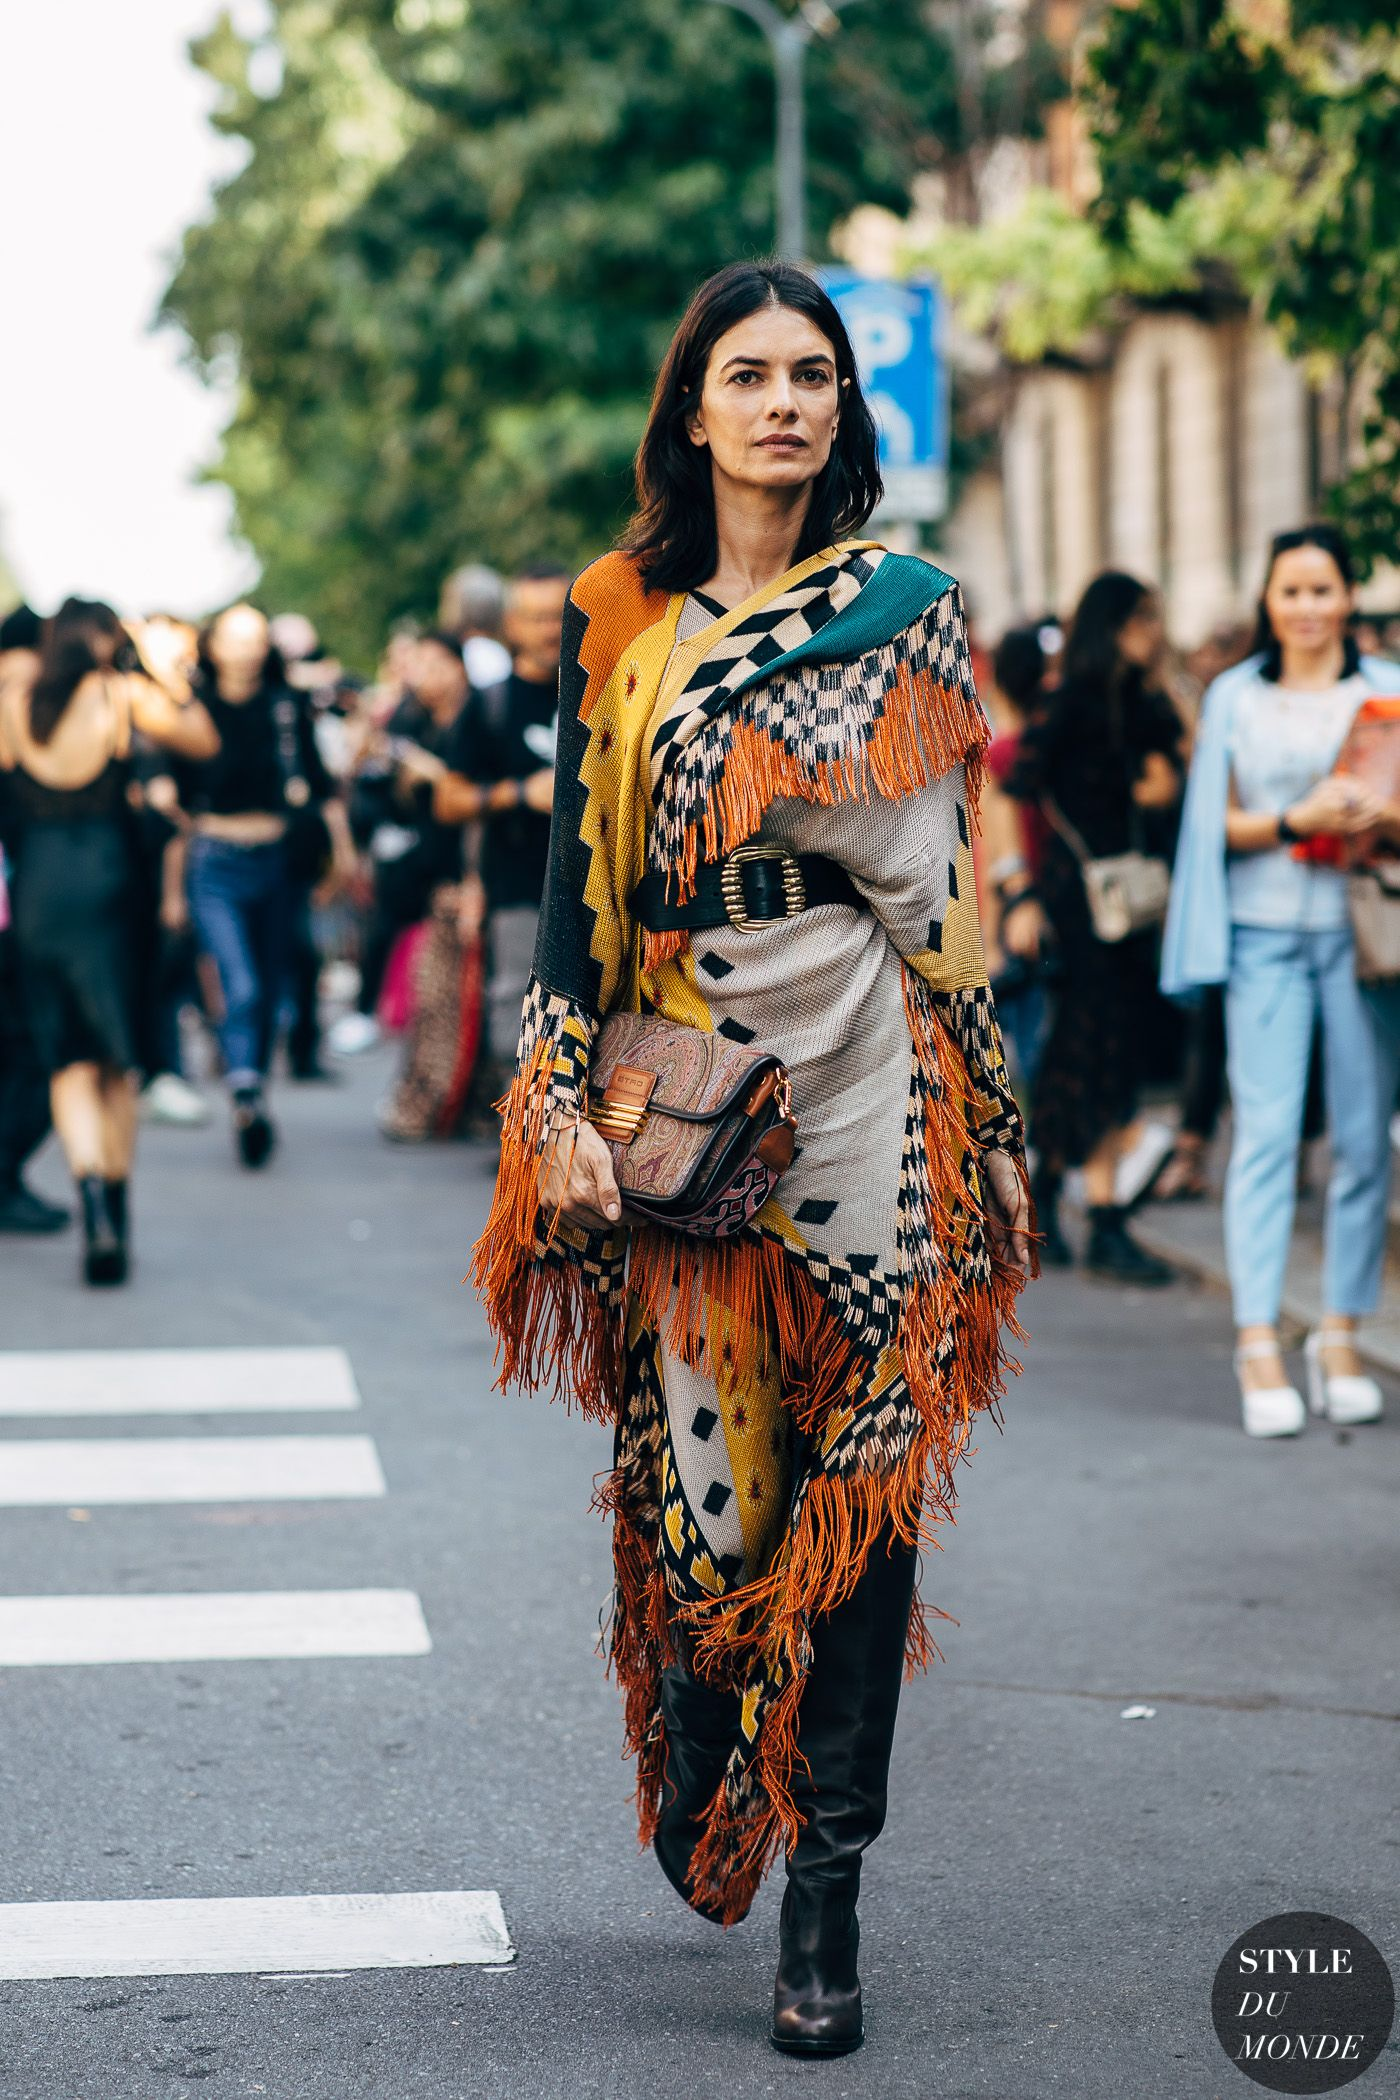 Milan SS 2019 Street Style: Leila Yavari - STYLE DU MONDE   Street Style Street Fashion Photos Leila Yavari